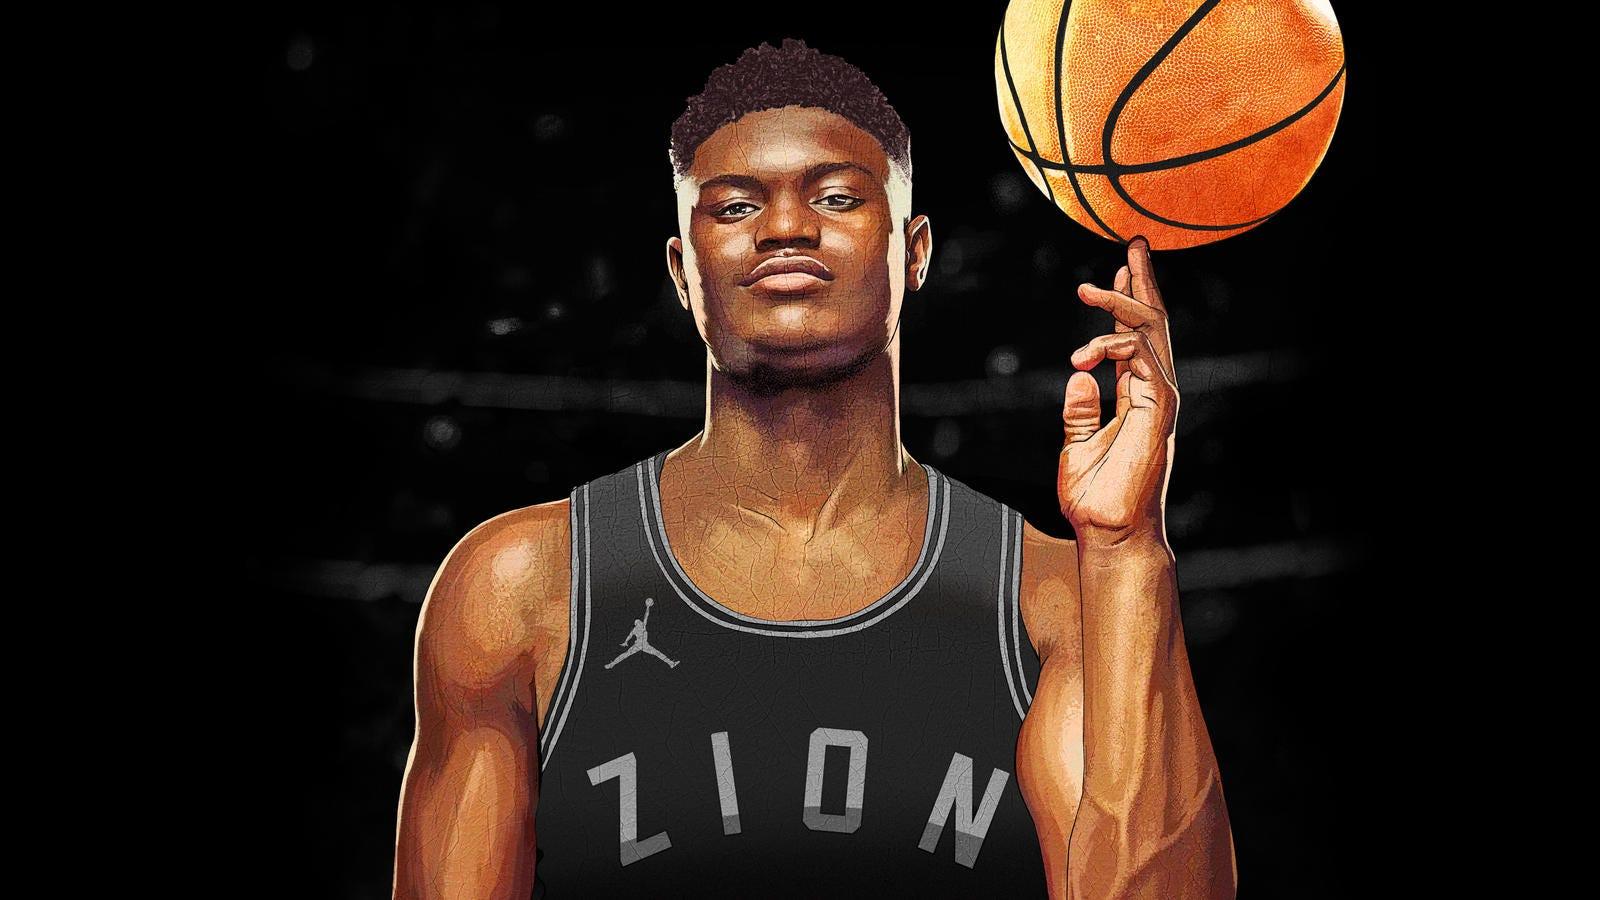 Zion Michael Jordan WilliamsonNba Endorsement With In Pairs Rookie qVpMzSU